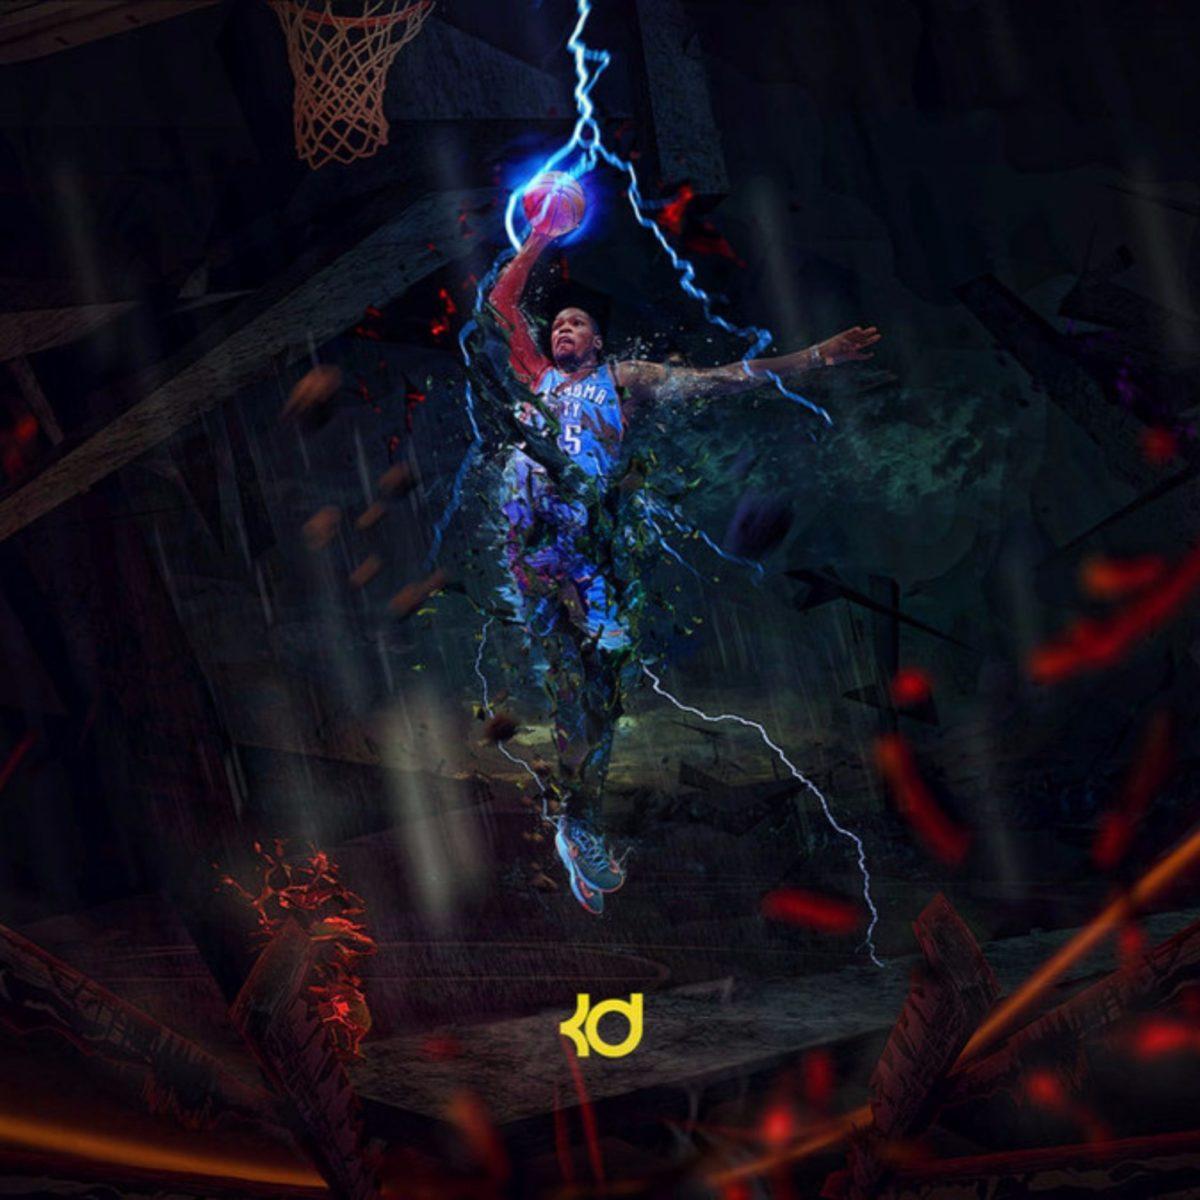 Blue Lightning Kevin Durant 4K Wallpapers   Free 4K Wallpaper